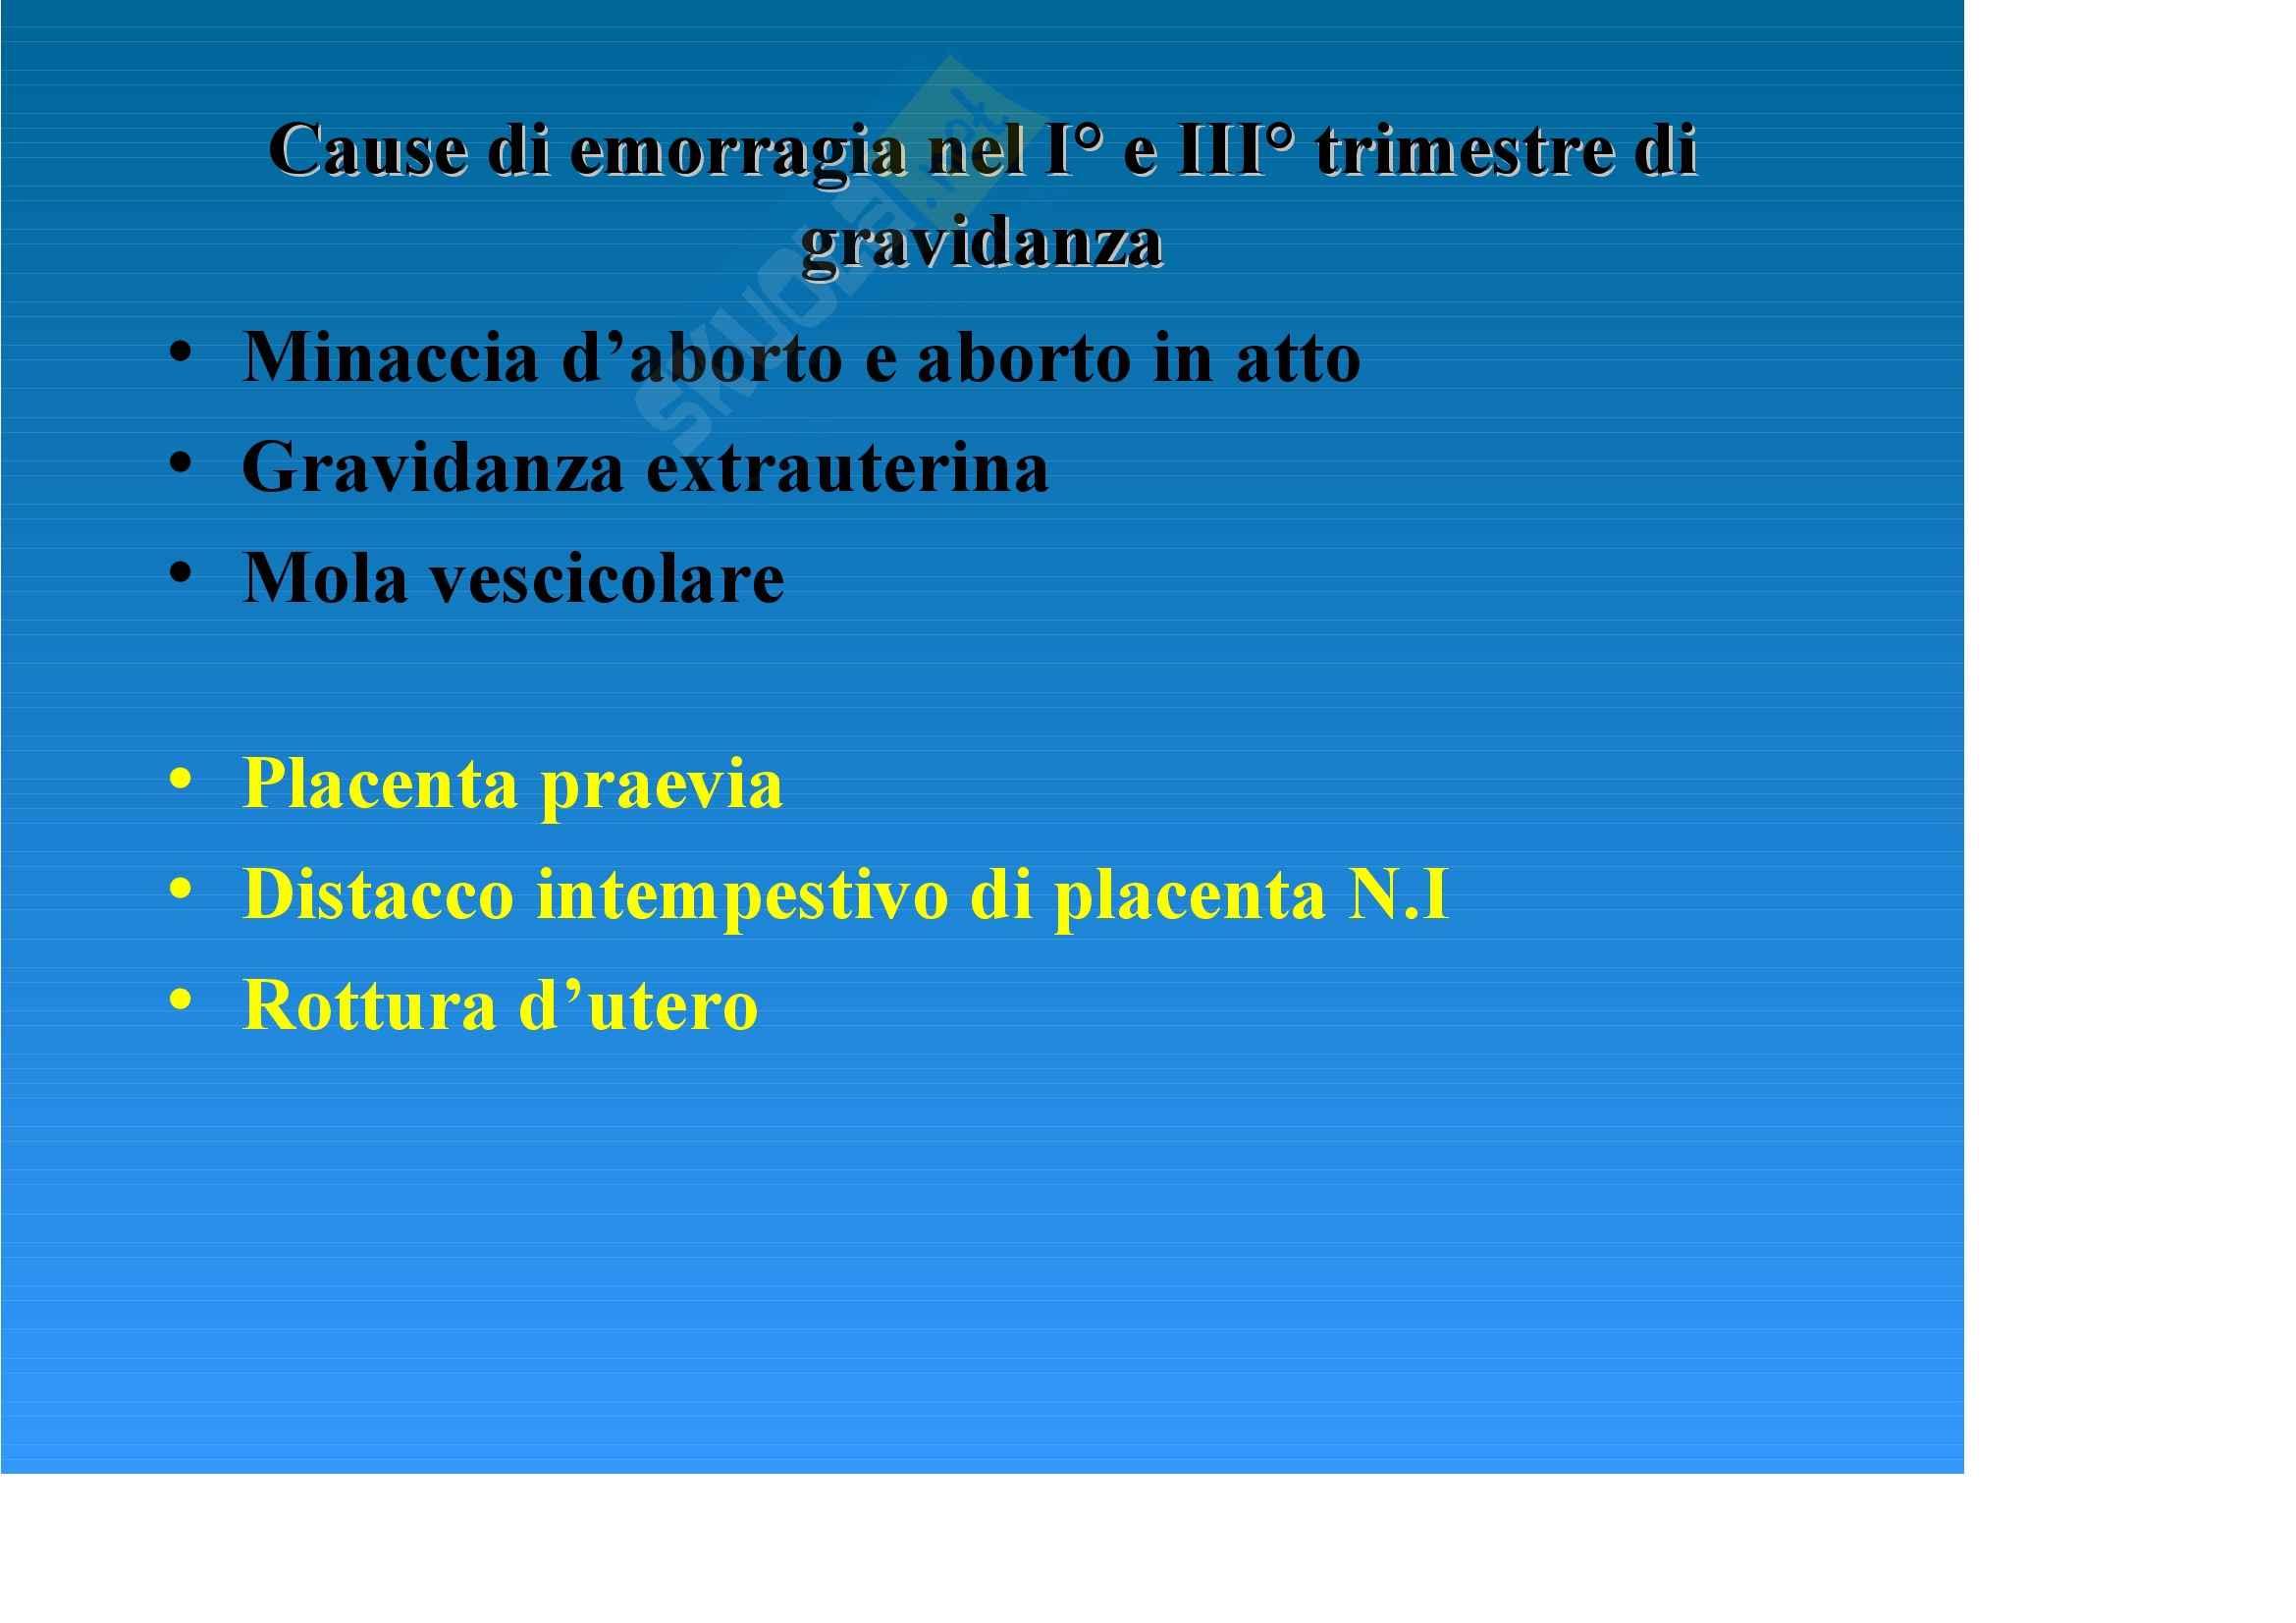 Ginecologia e ostetricia - Emorragie